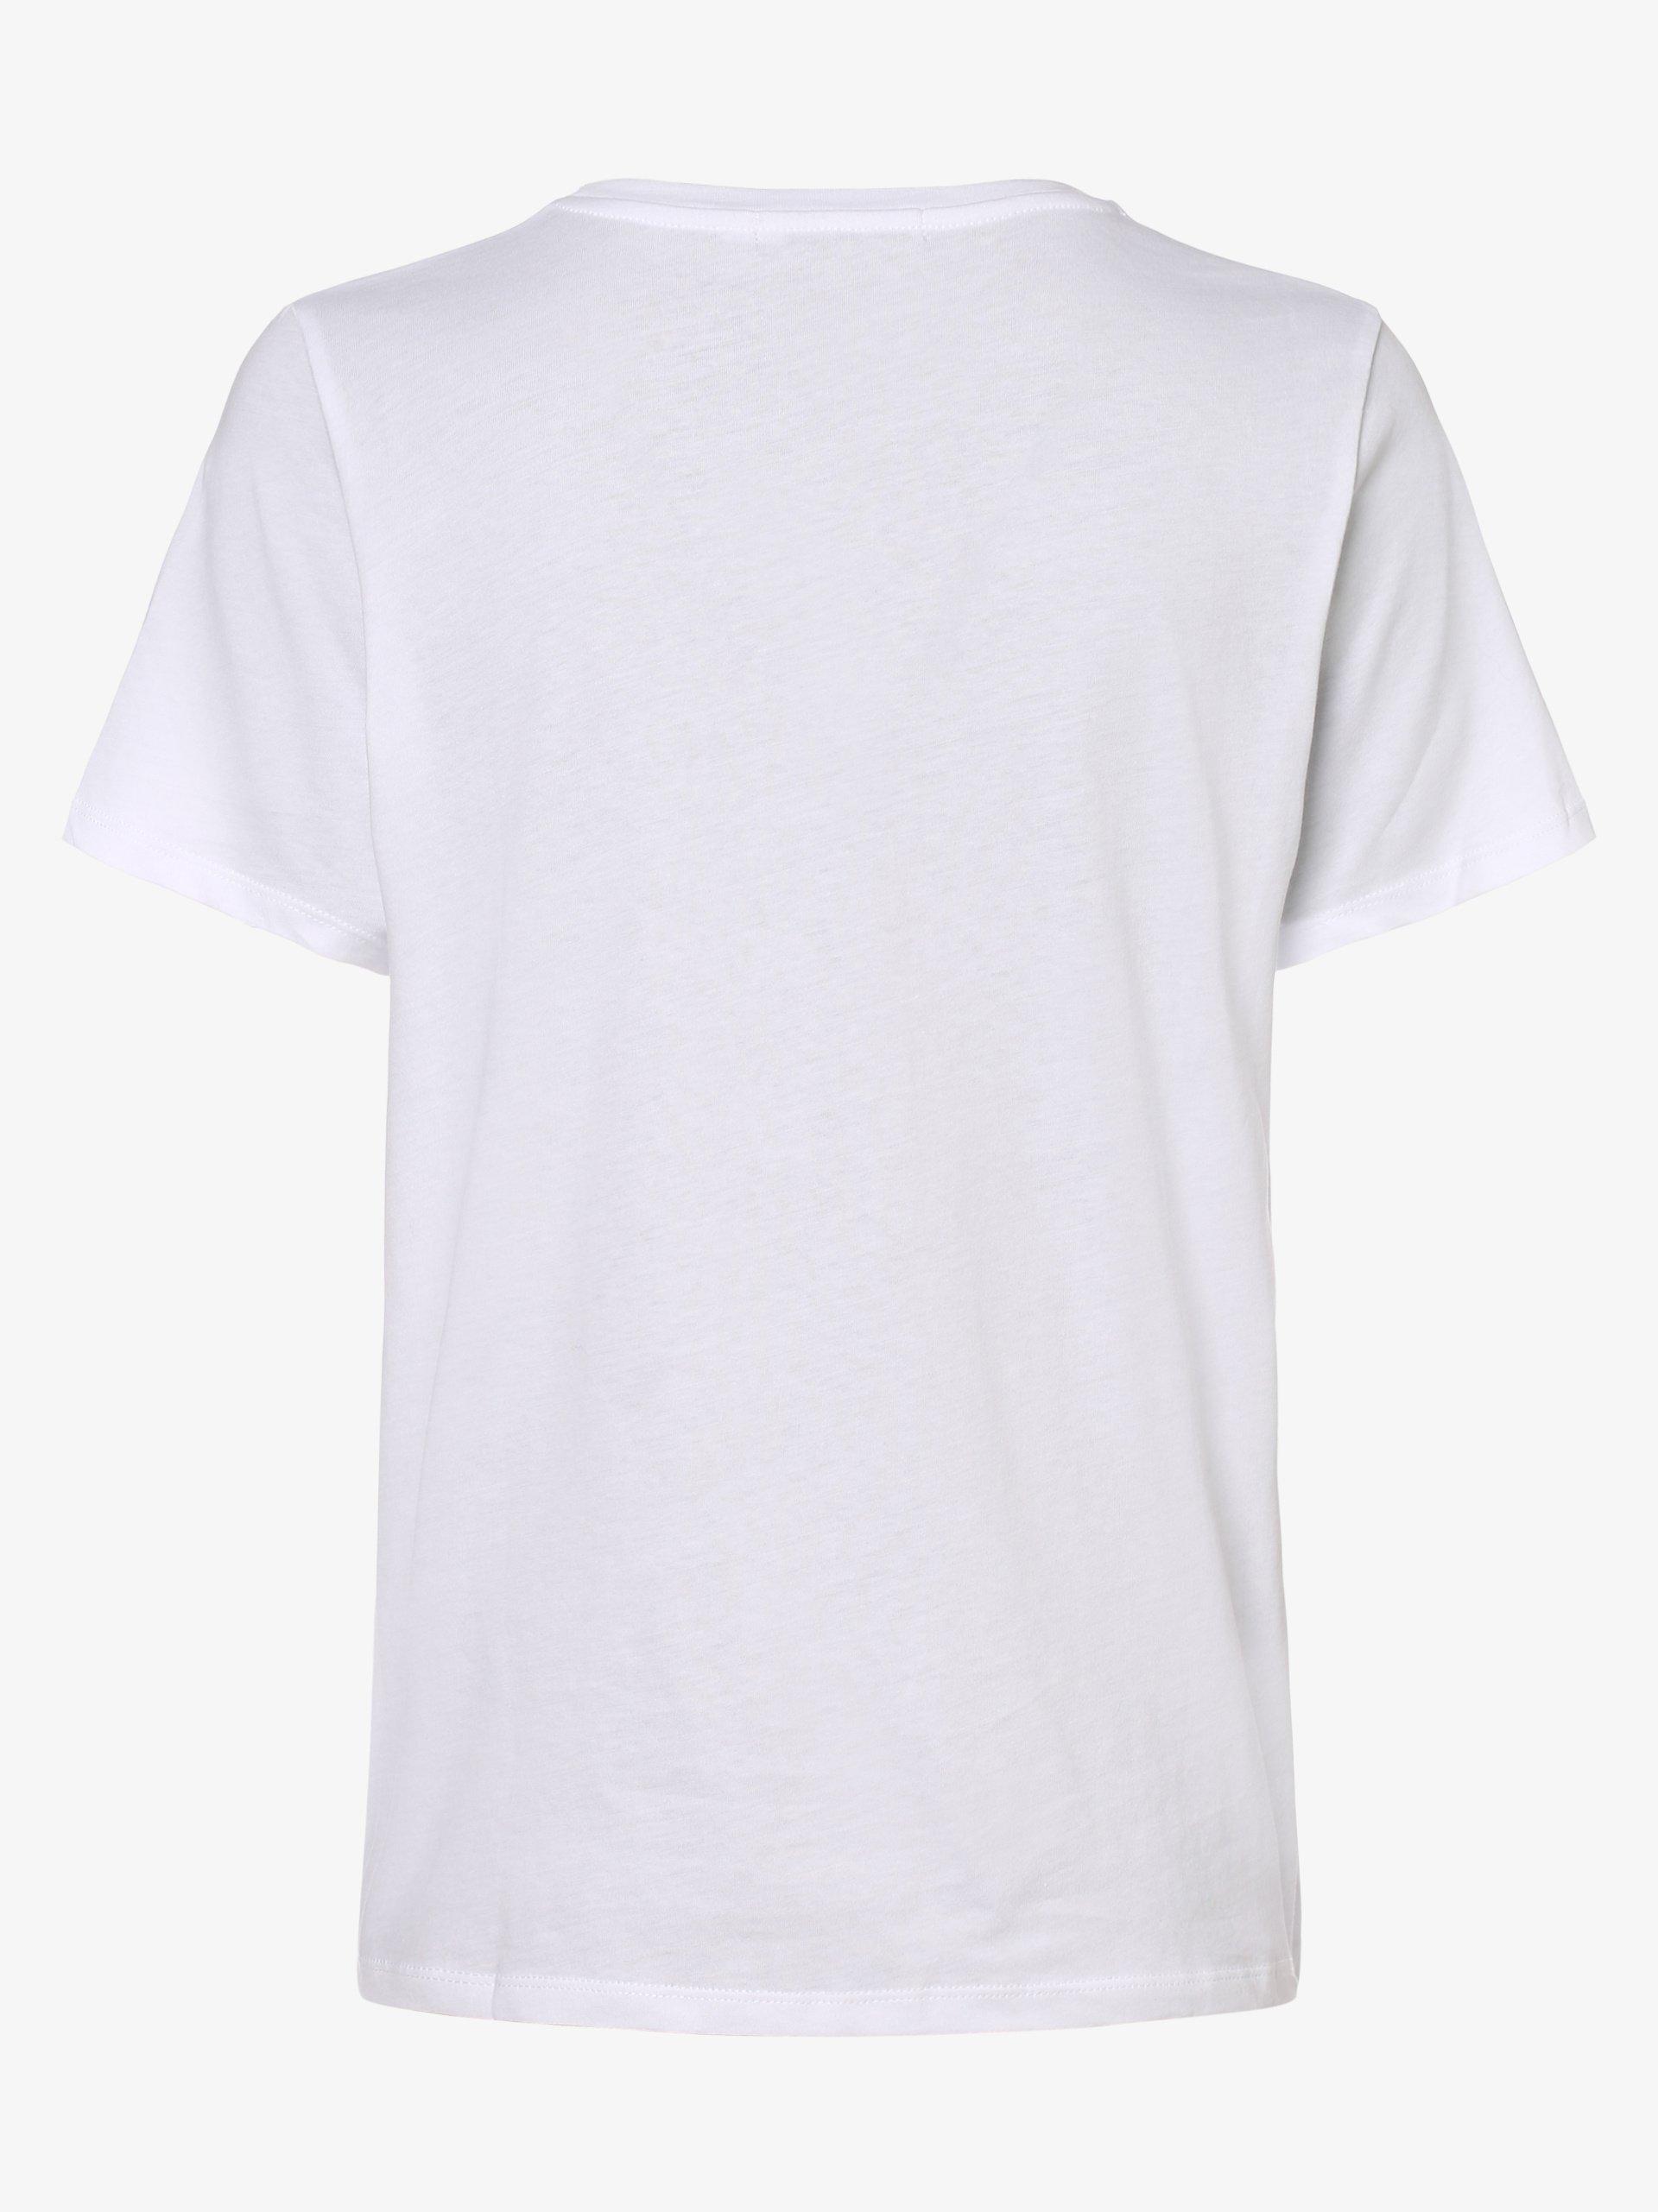 NA-KD Damen T-Shirt - Statue Tee